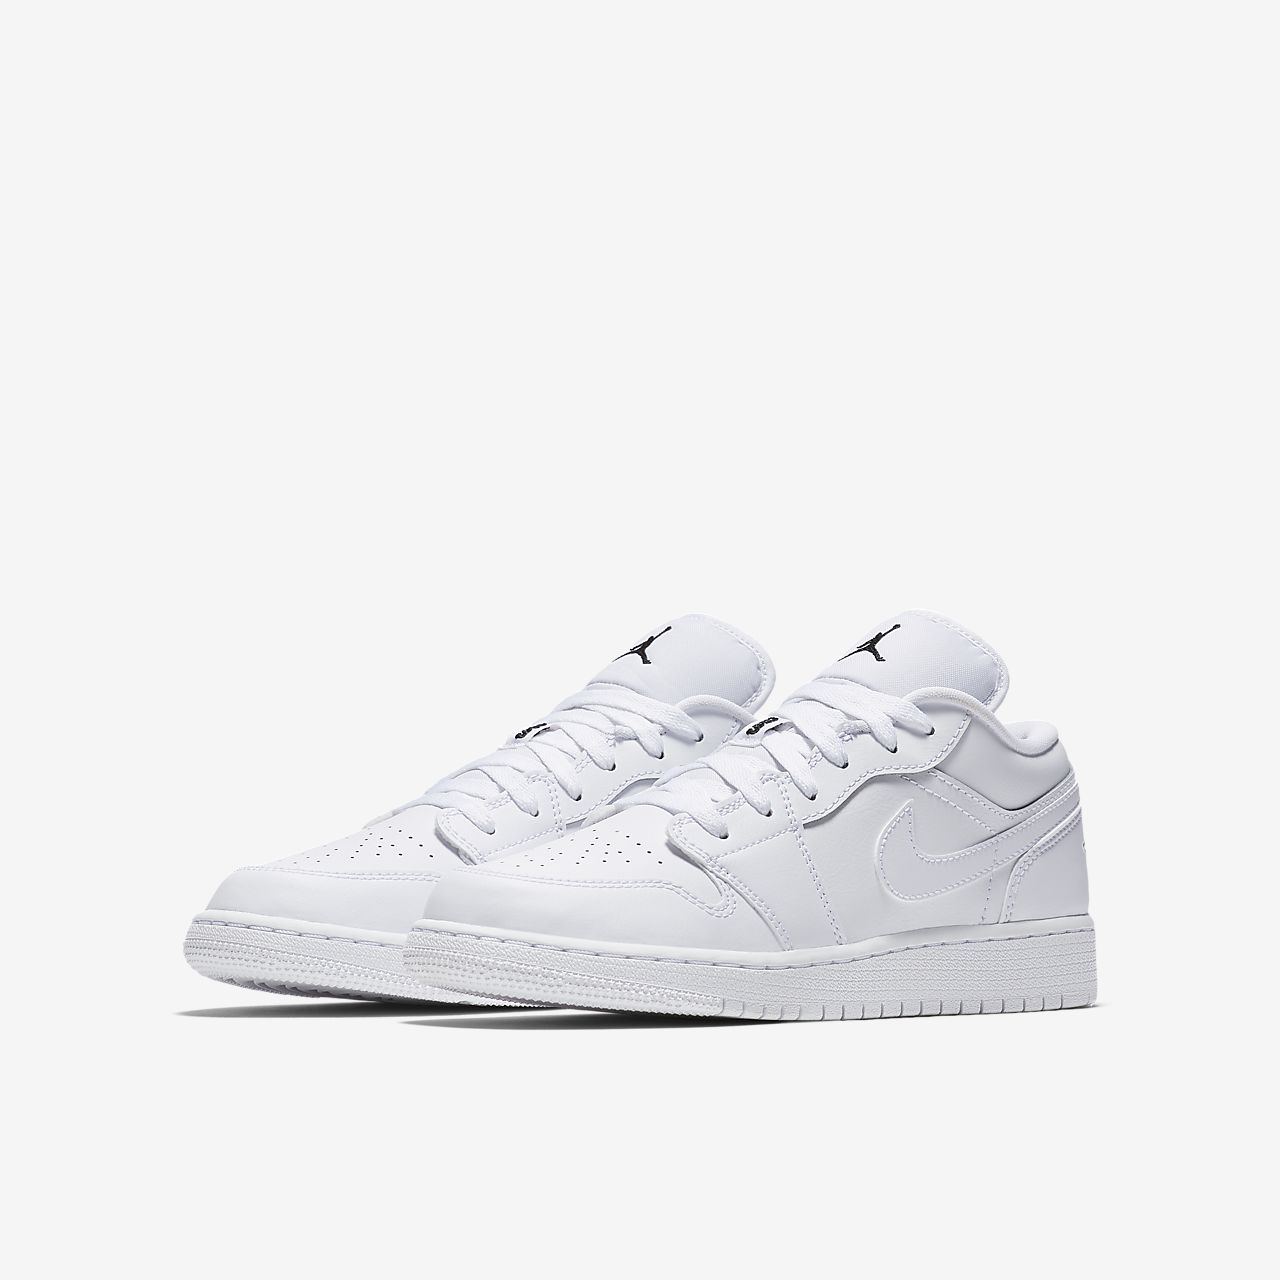 the latest 20712 59941 ... Air Jordan 1 Low Older Kids  Shoe